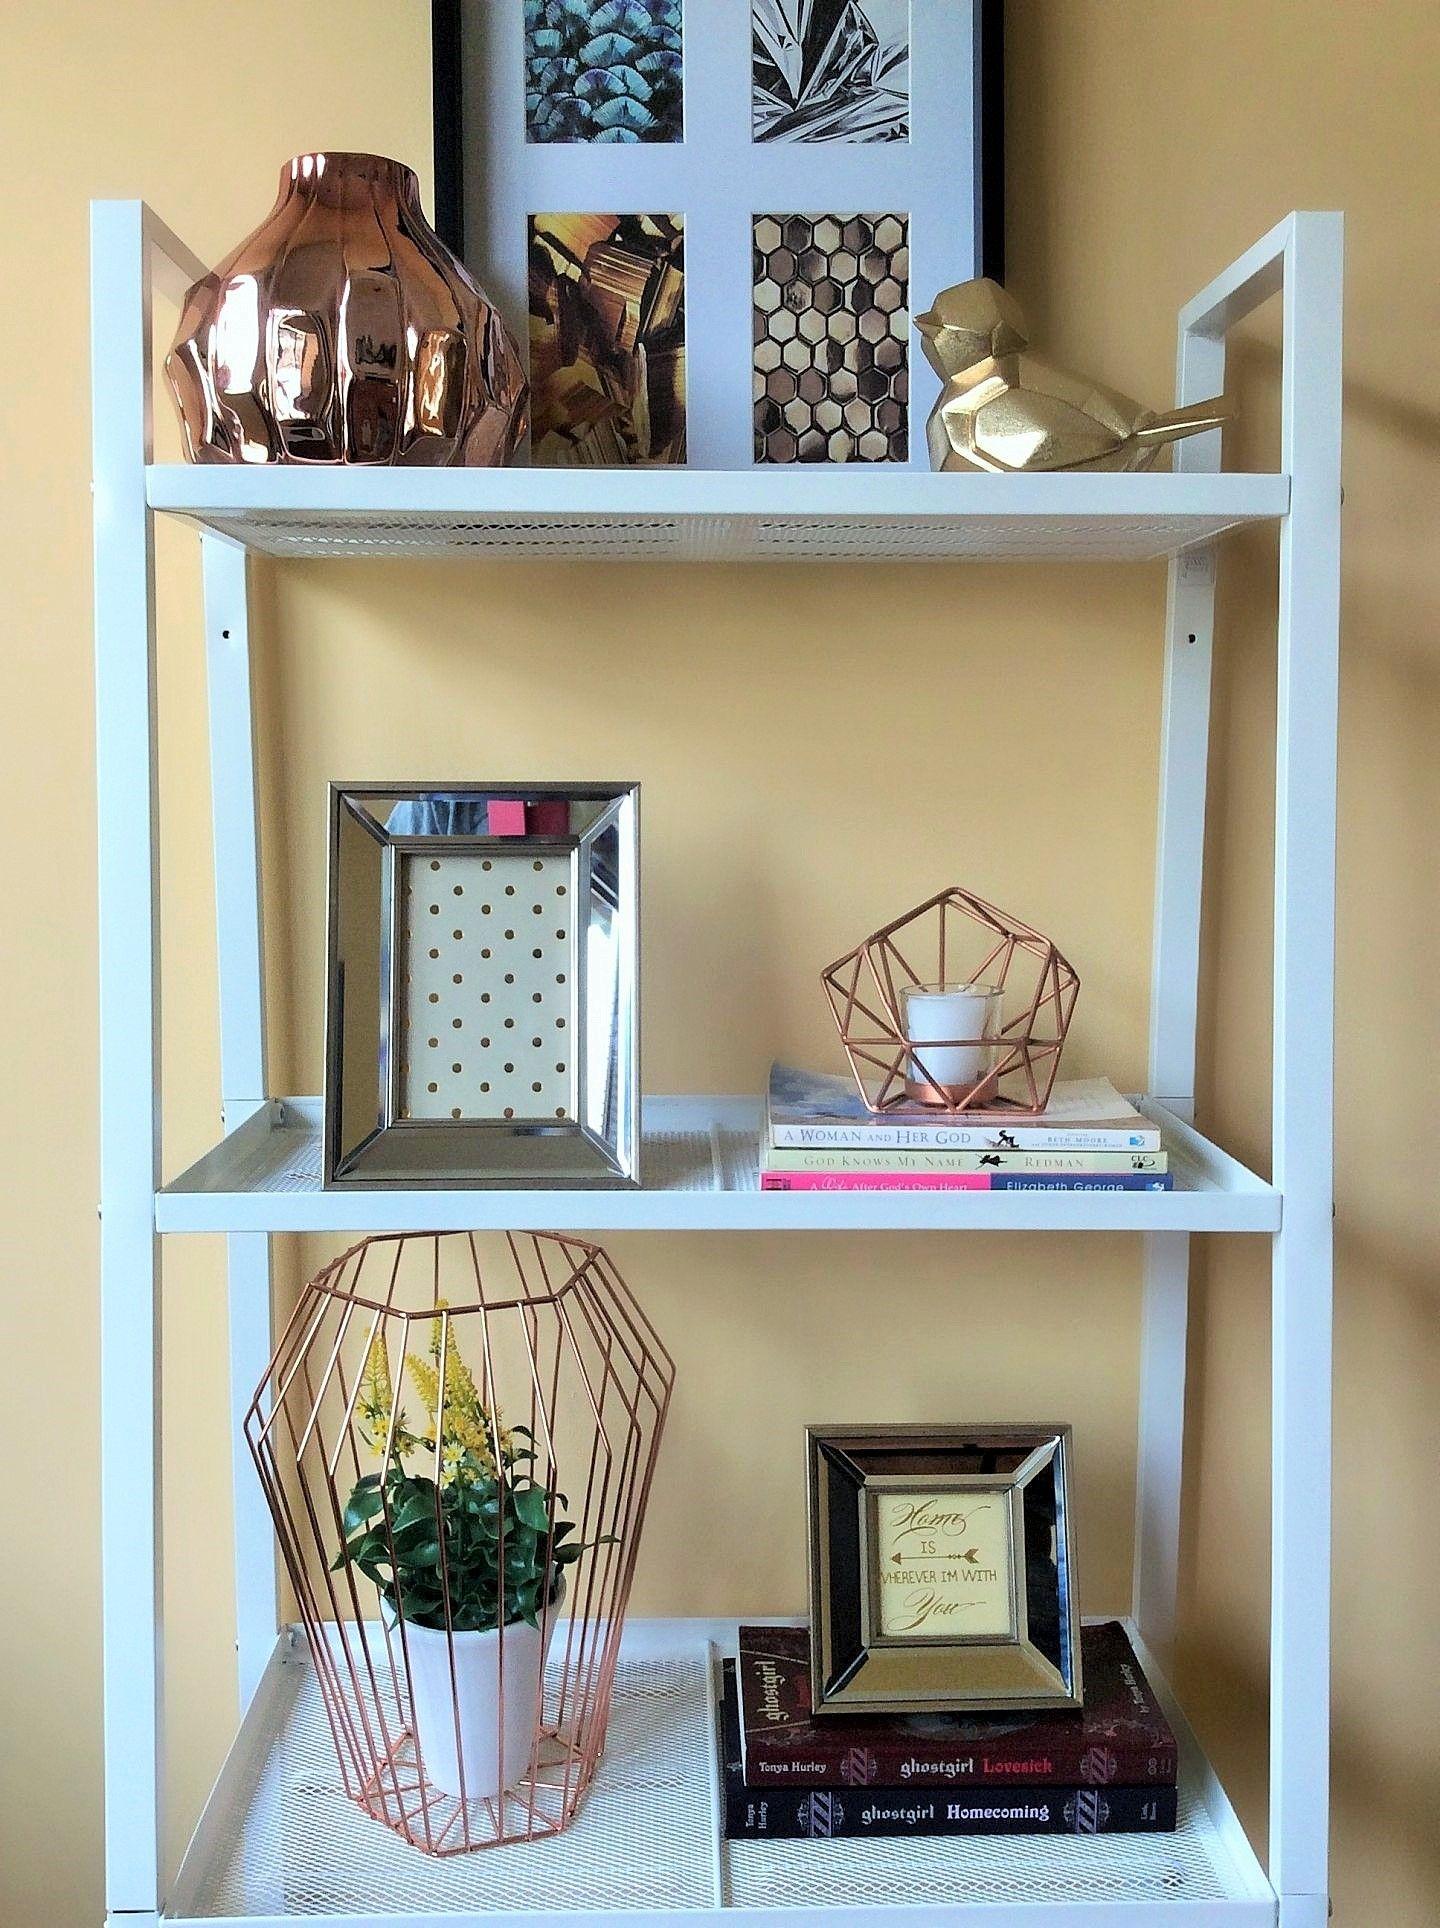 How To Style An Ikea Lerberg Shelf A Hack Home Wiring Cabinet